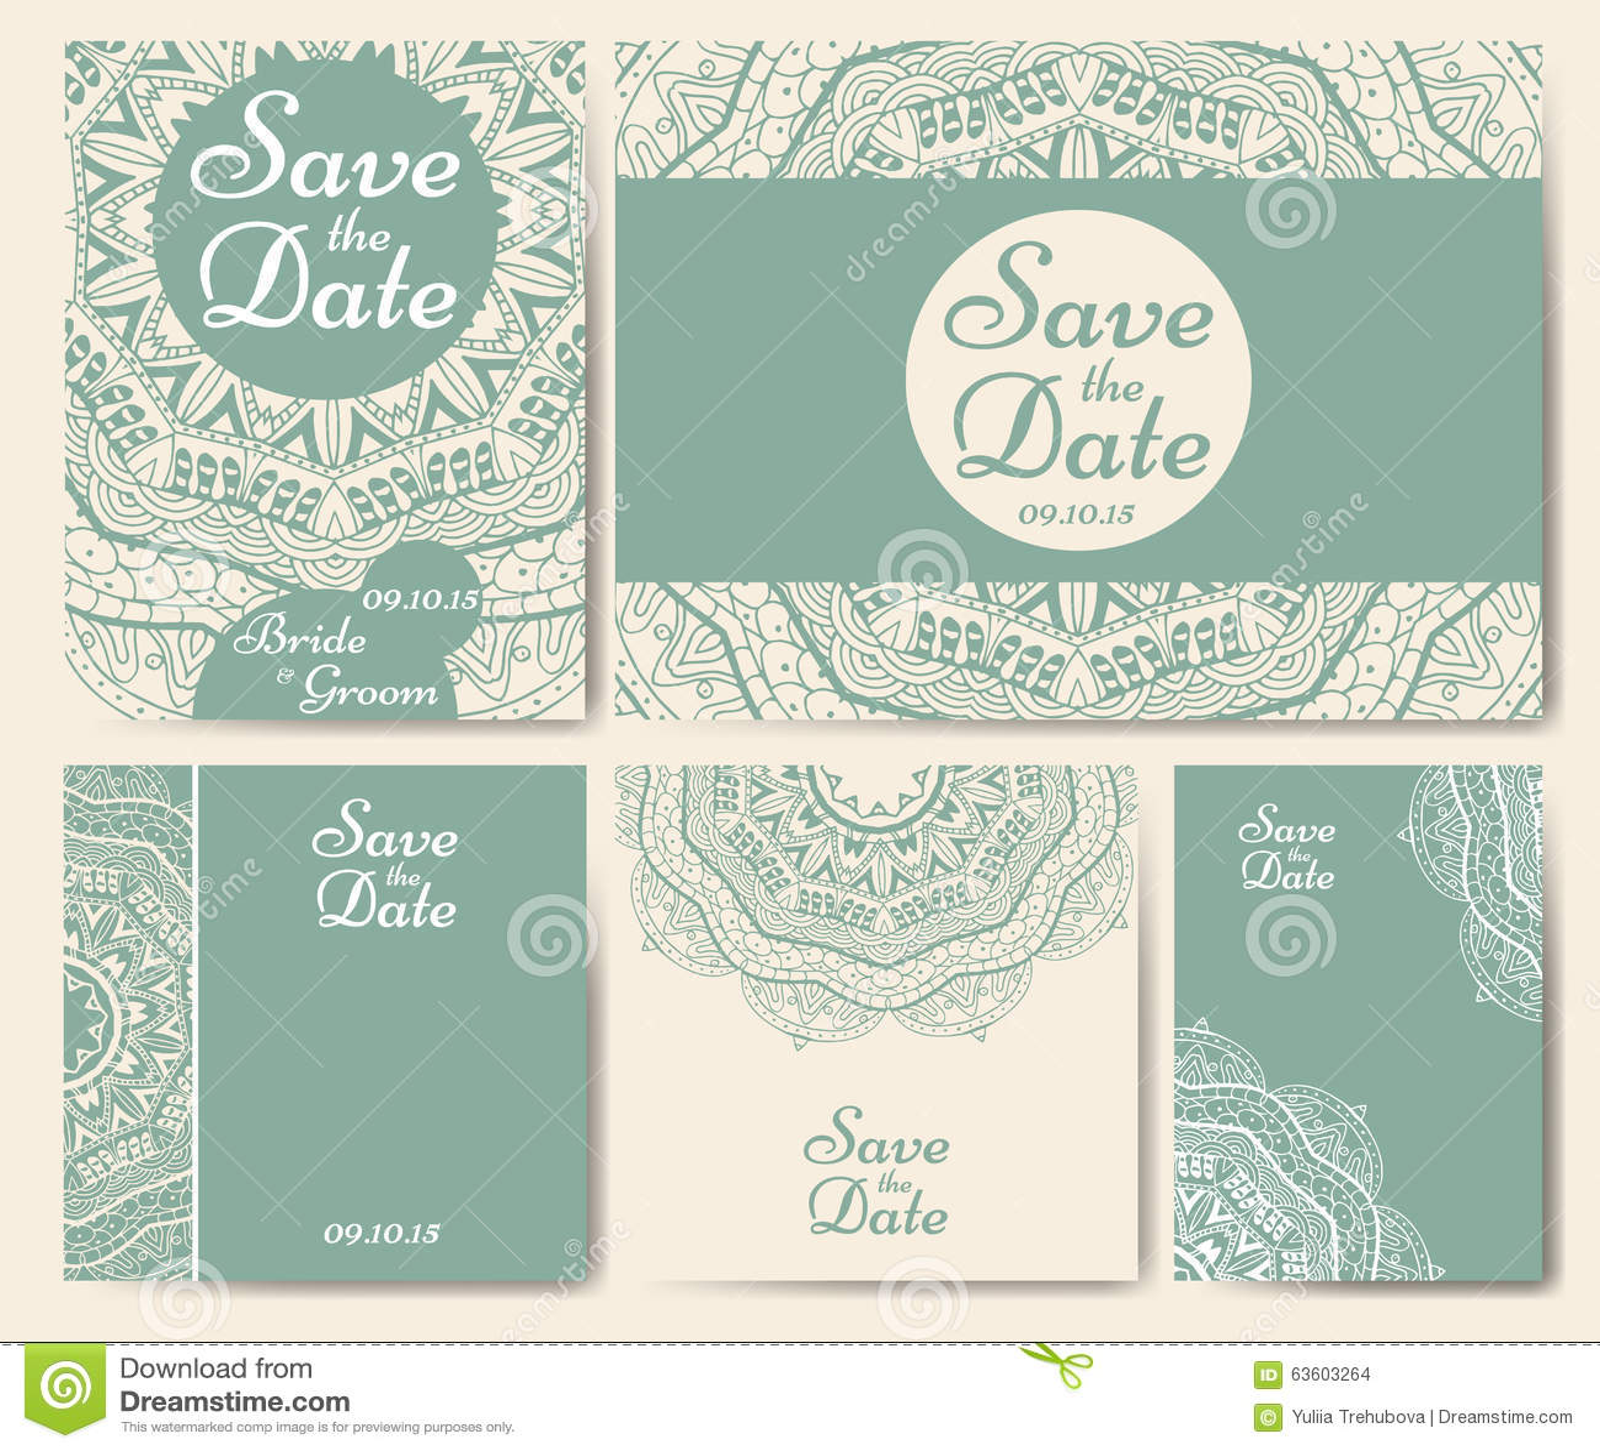 fairytale thank you card thank you wedding cards